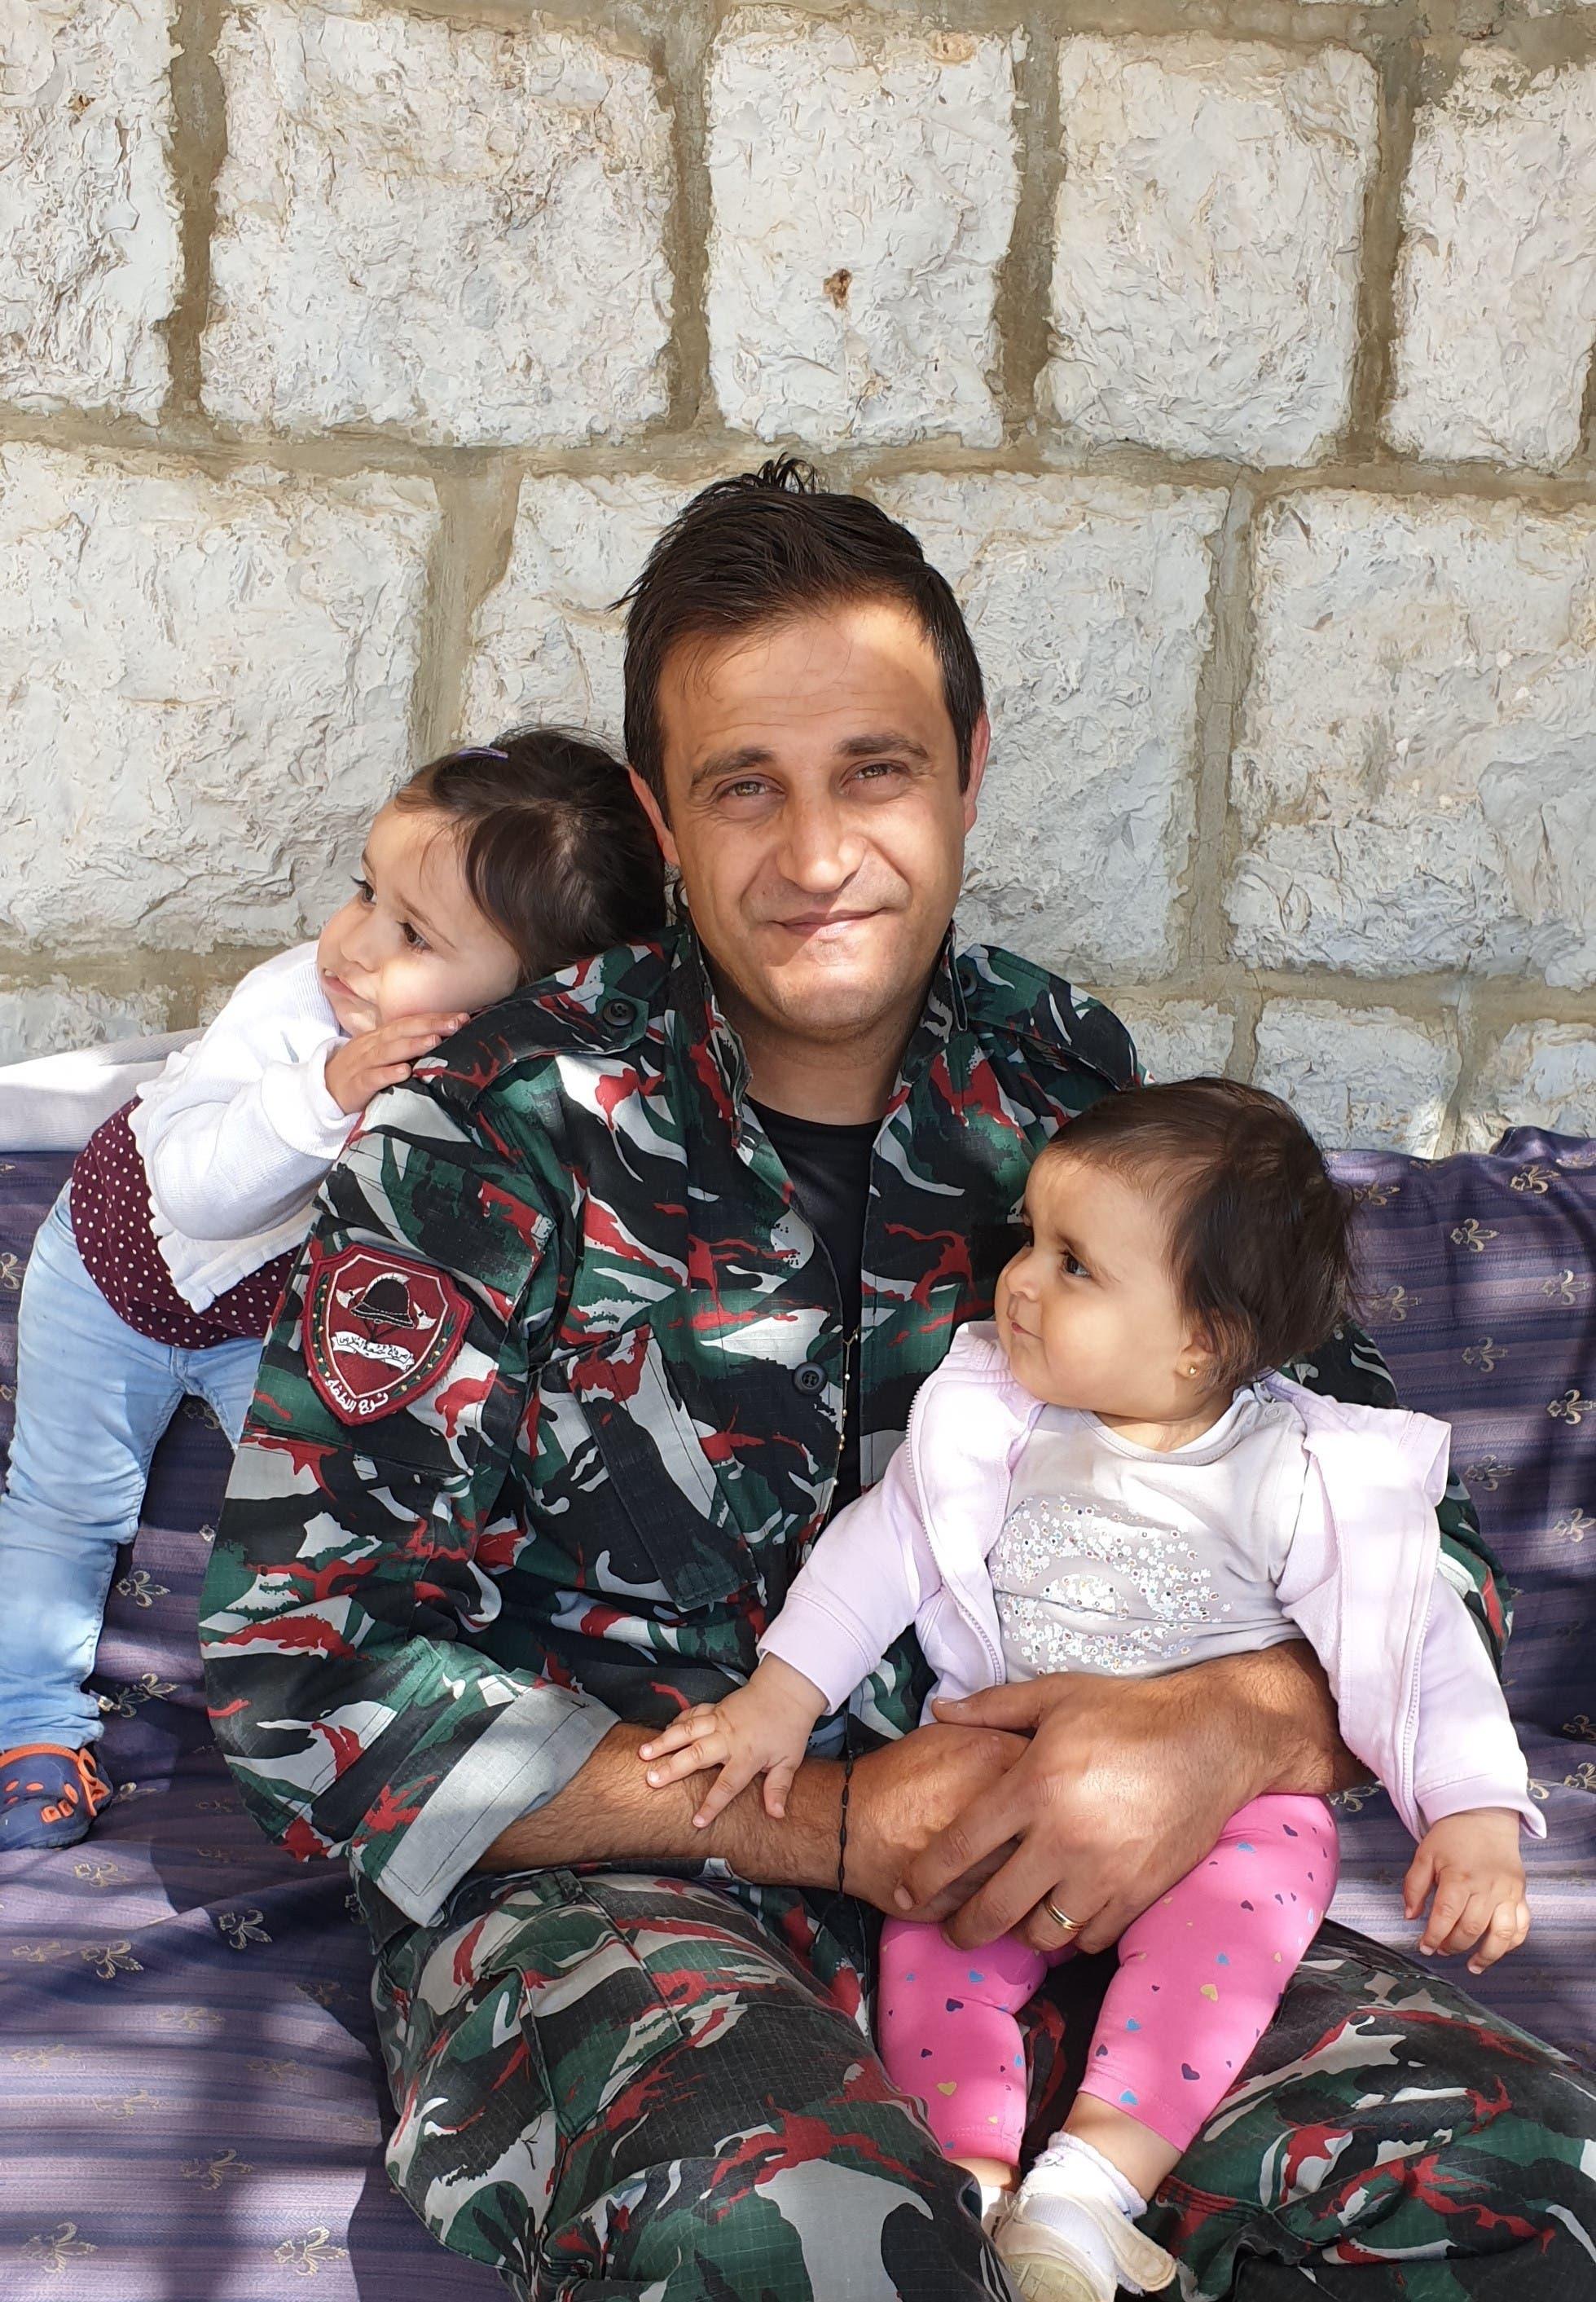 Charbel Karam with his daughters. (Credit: Karlen Hitti-Karam)